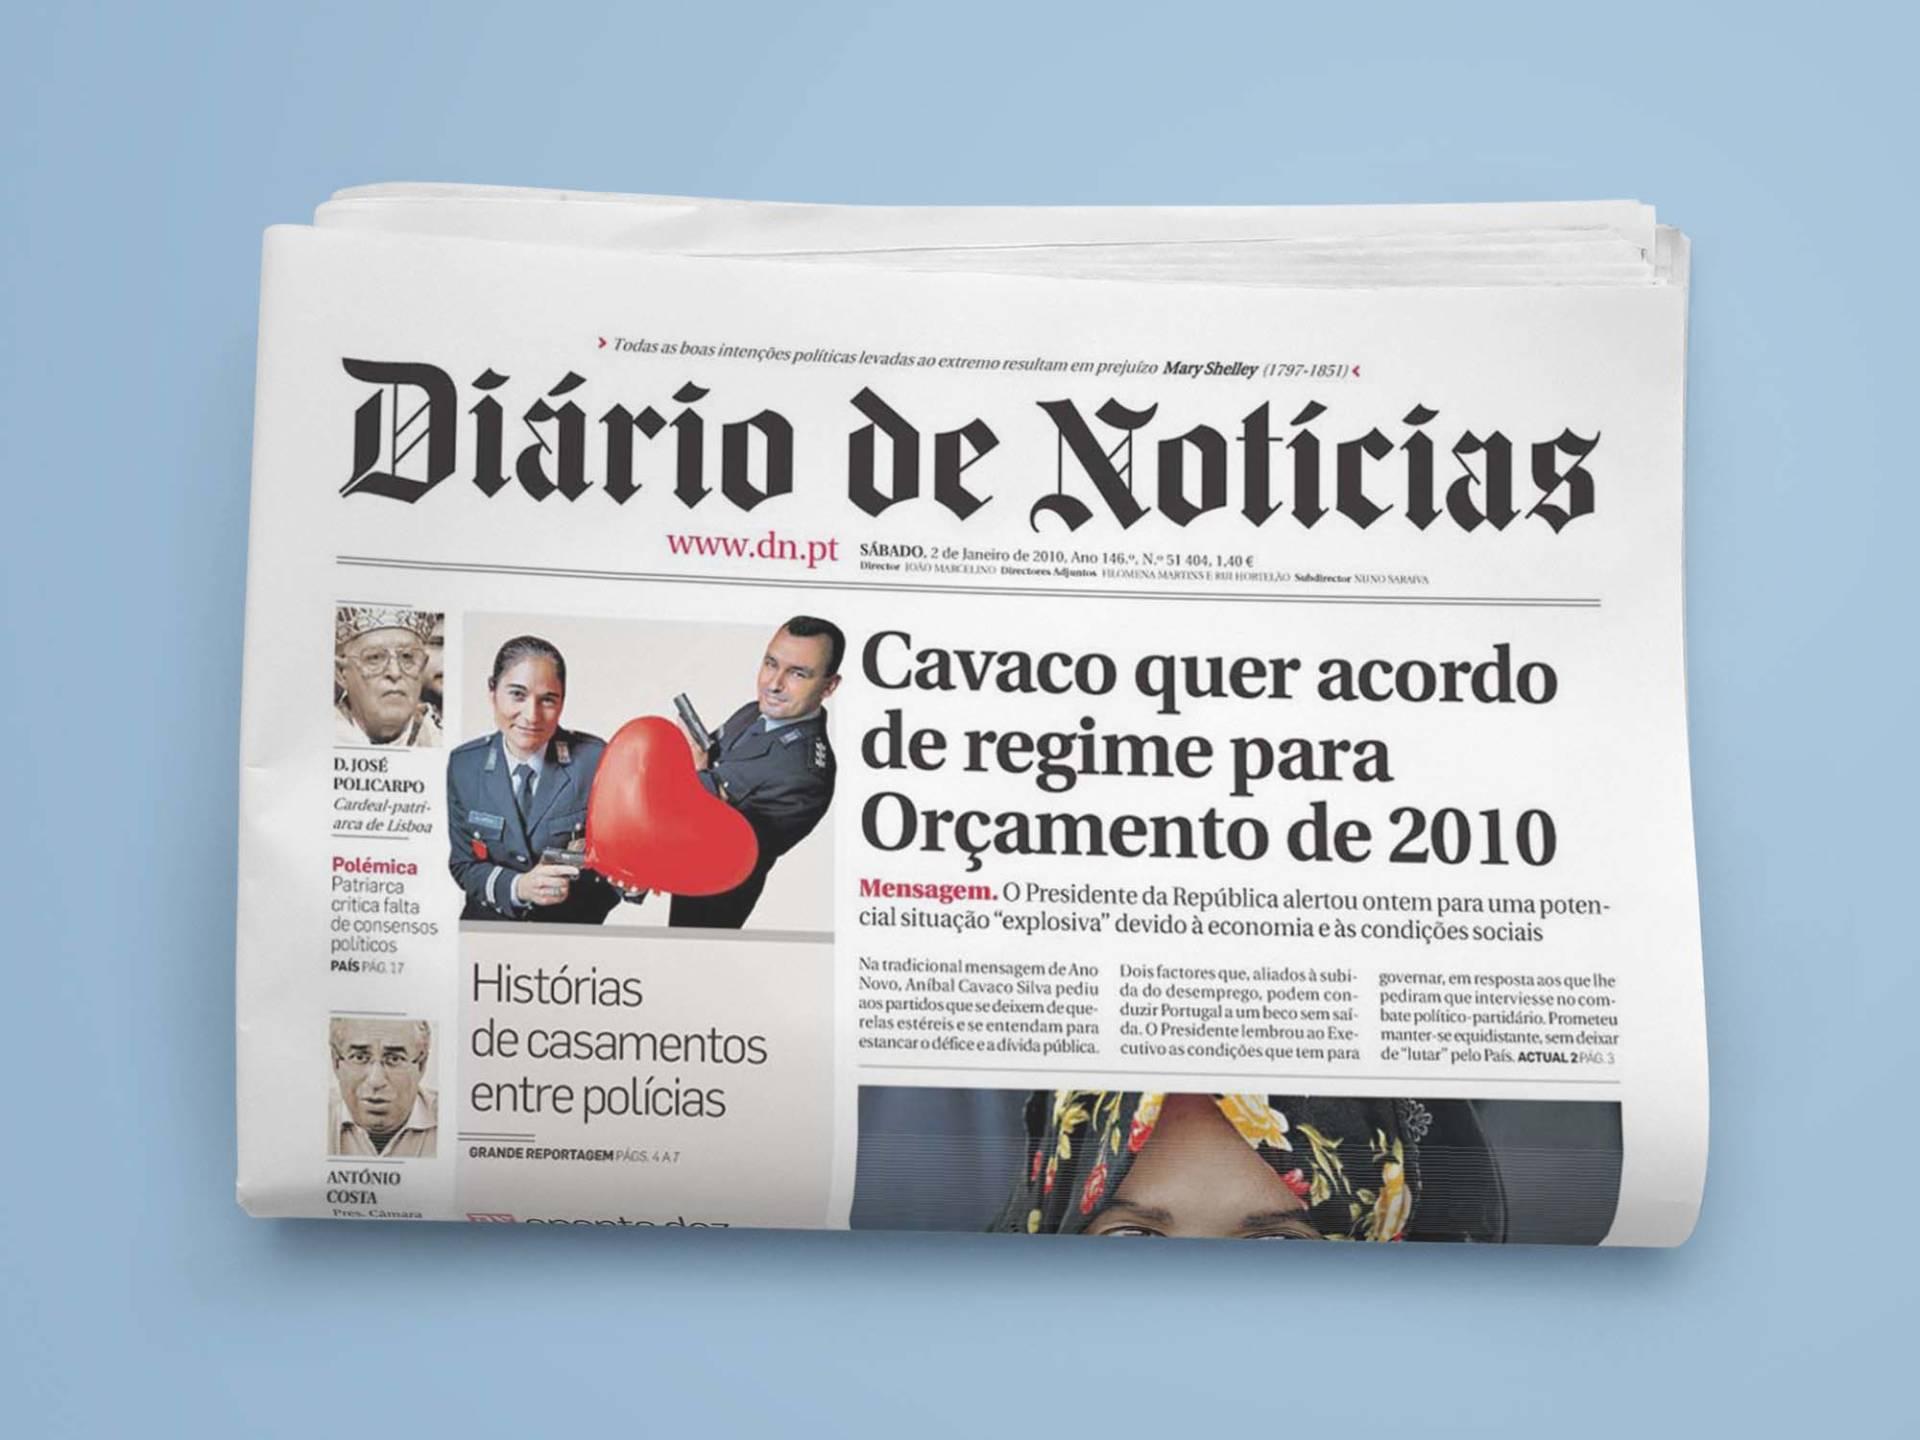 Diario_De_Noticias_01_Wenceslau_News_Design